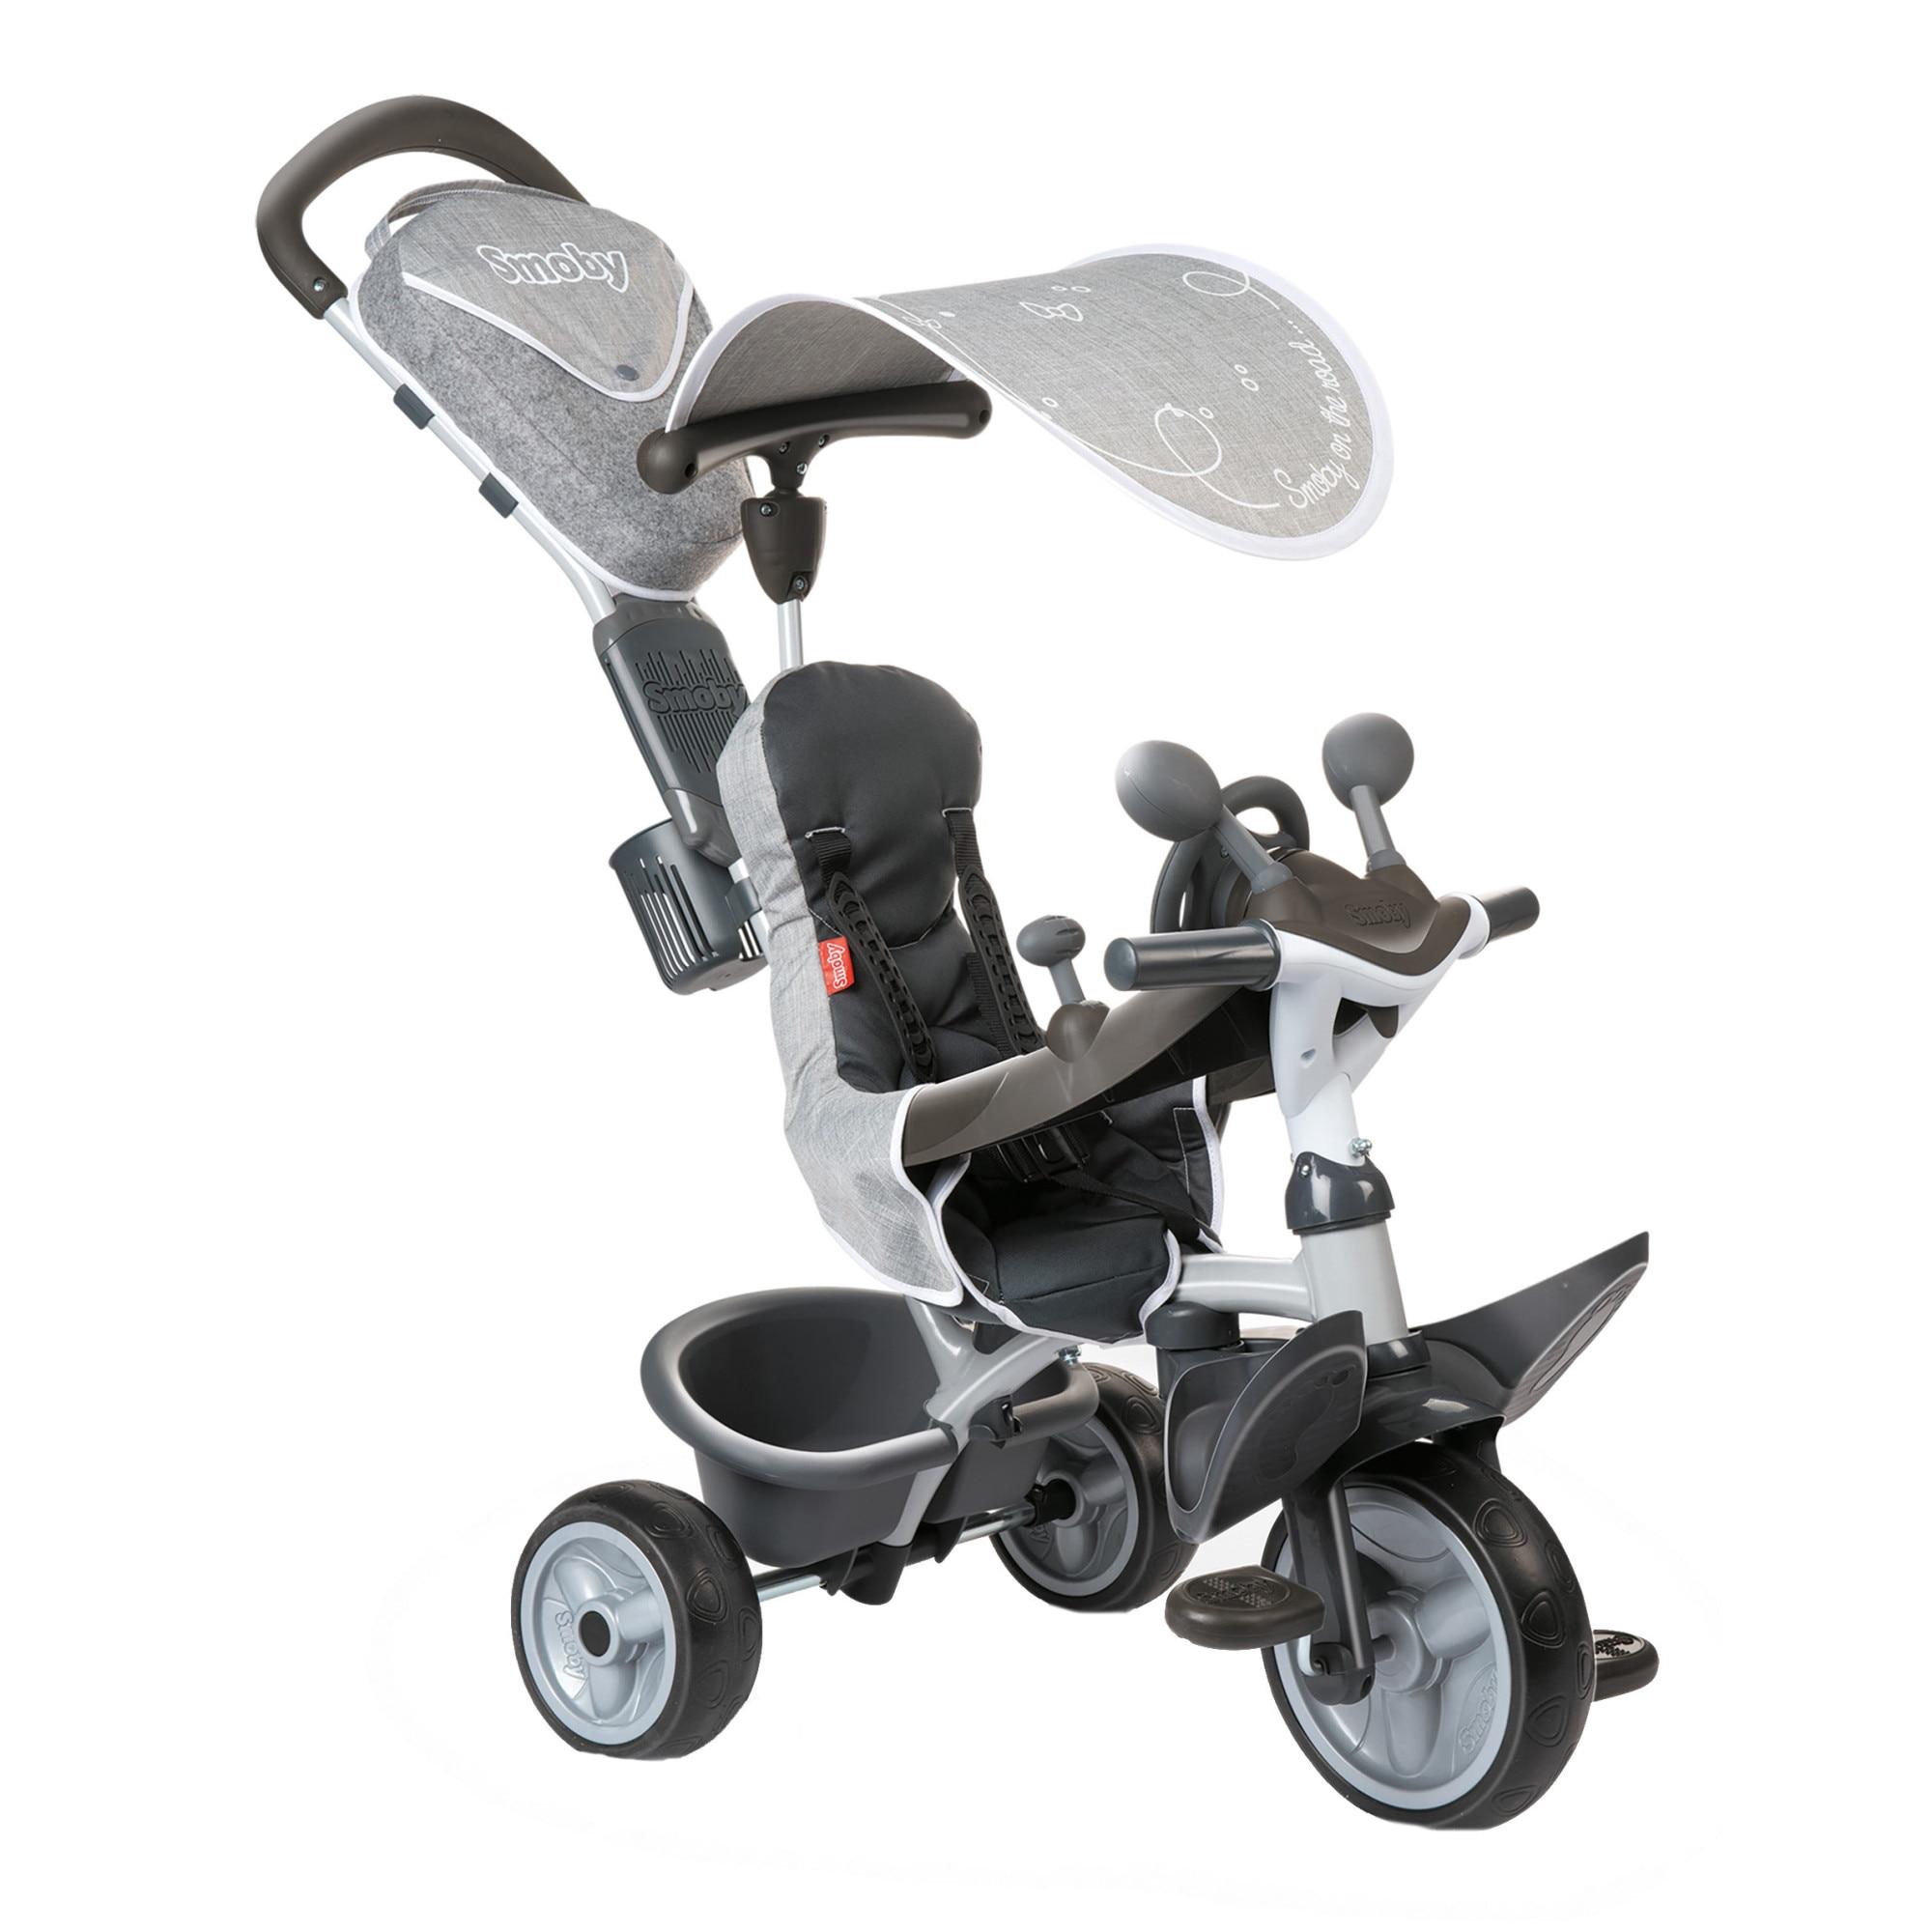 Fotografie Tricicleta Smoby Baby Driver Comfort, cu roti silentioase, Gri